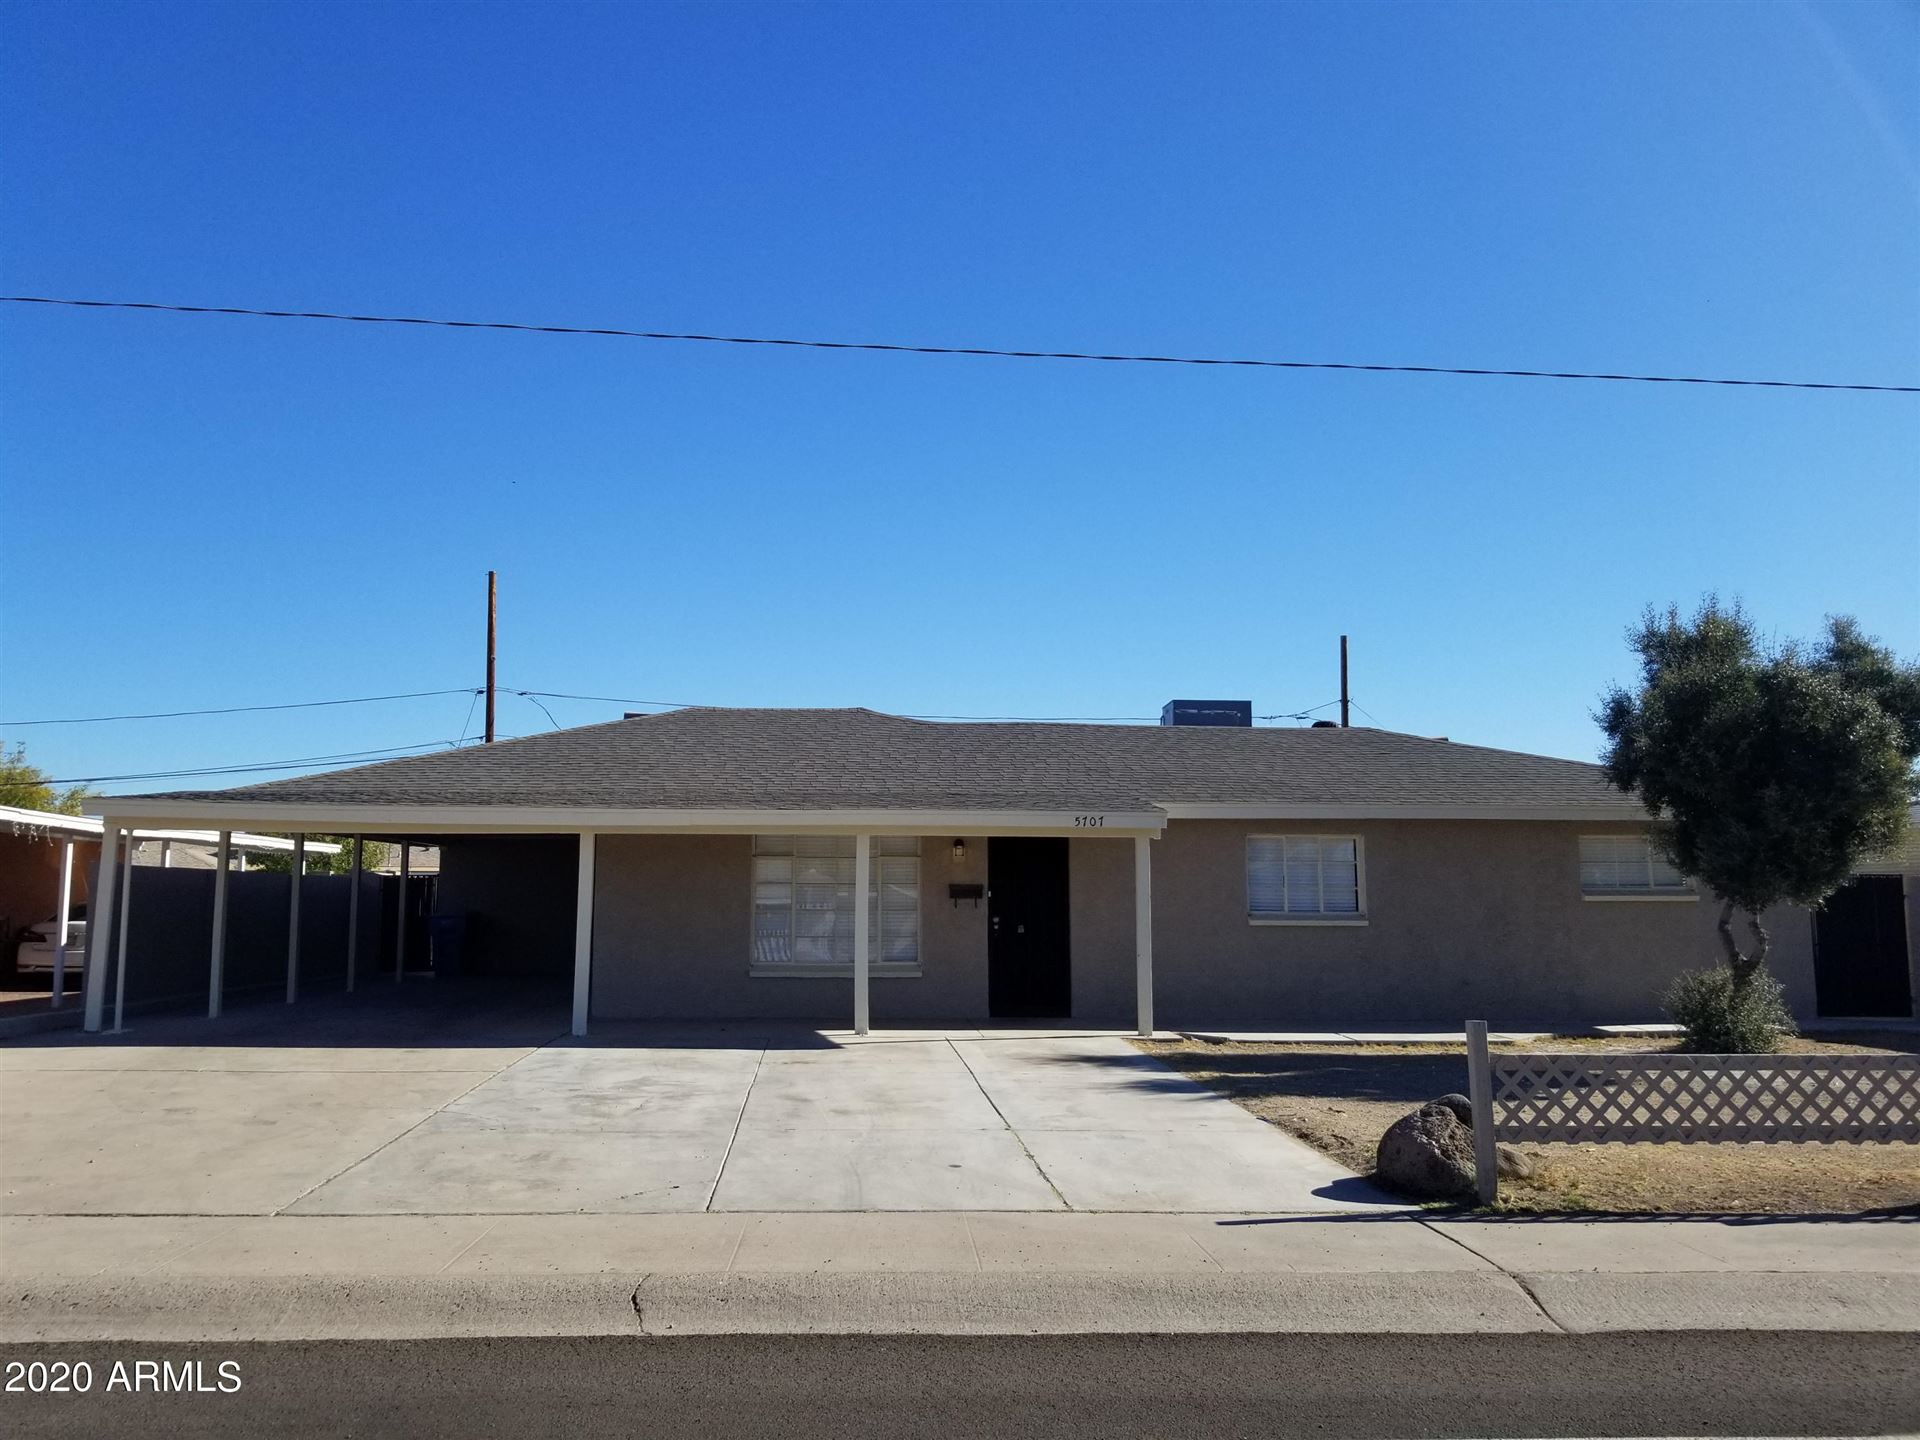 5707 N 23RD Avenue, Phoenix, AZ 85015 - MLS#: 6169731